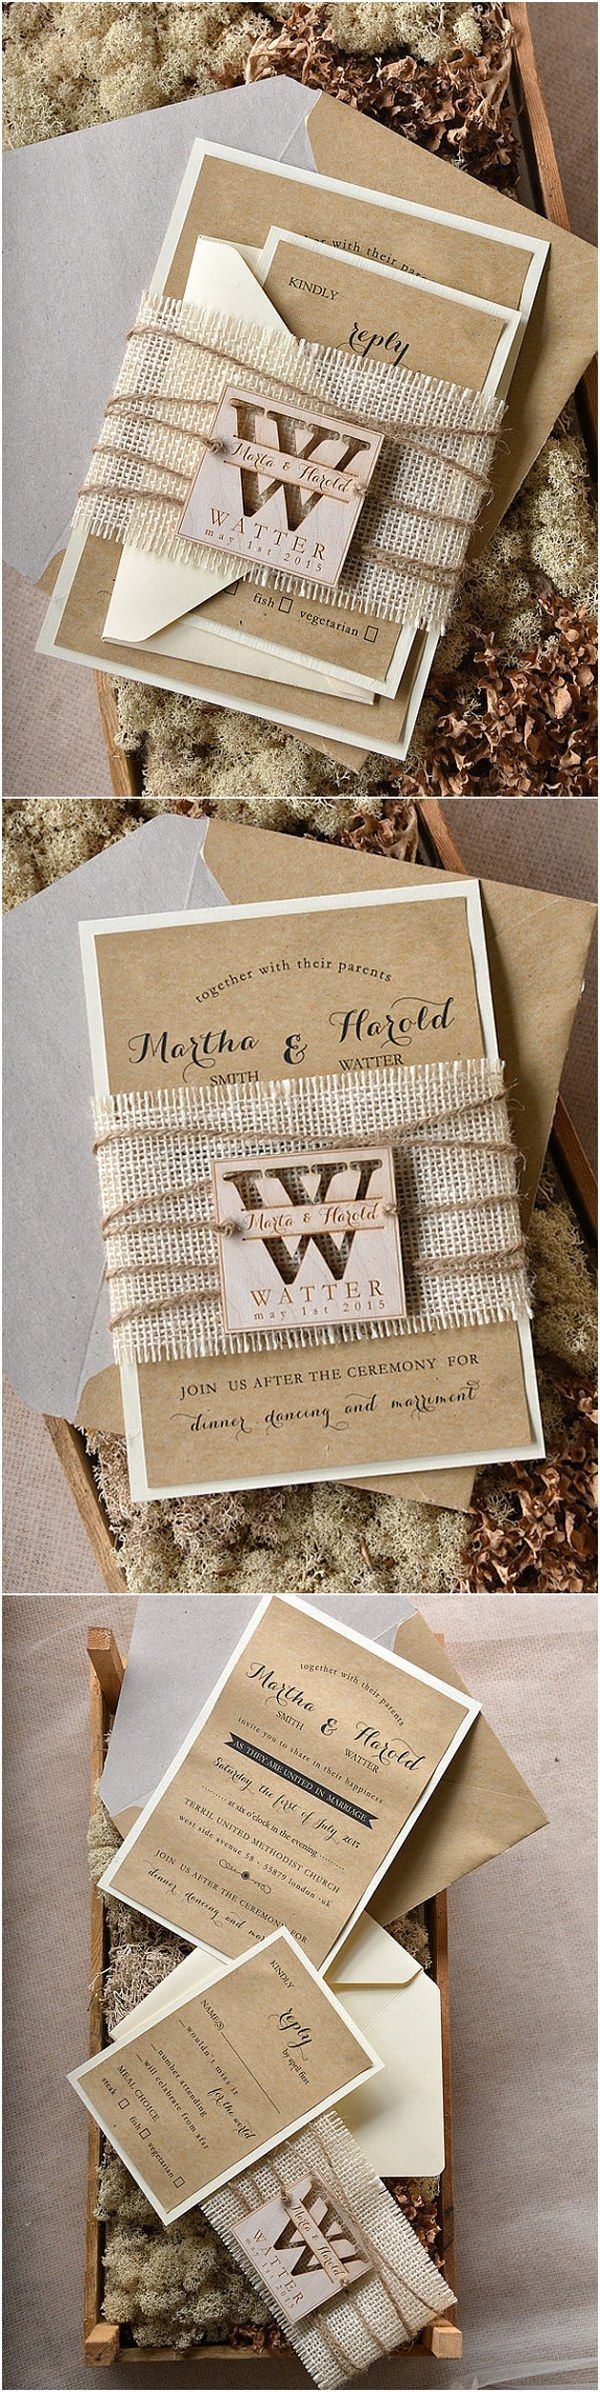 western wedding invitations skull wedding invitations rustic country burlap wedding invitations 4LOVEPolkaDots rusticwedding countryweding weddingideas